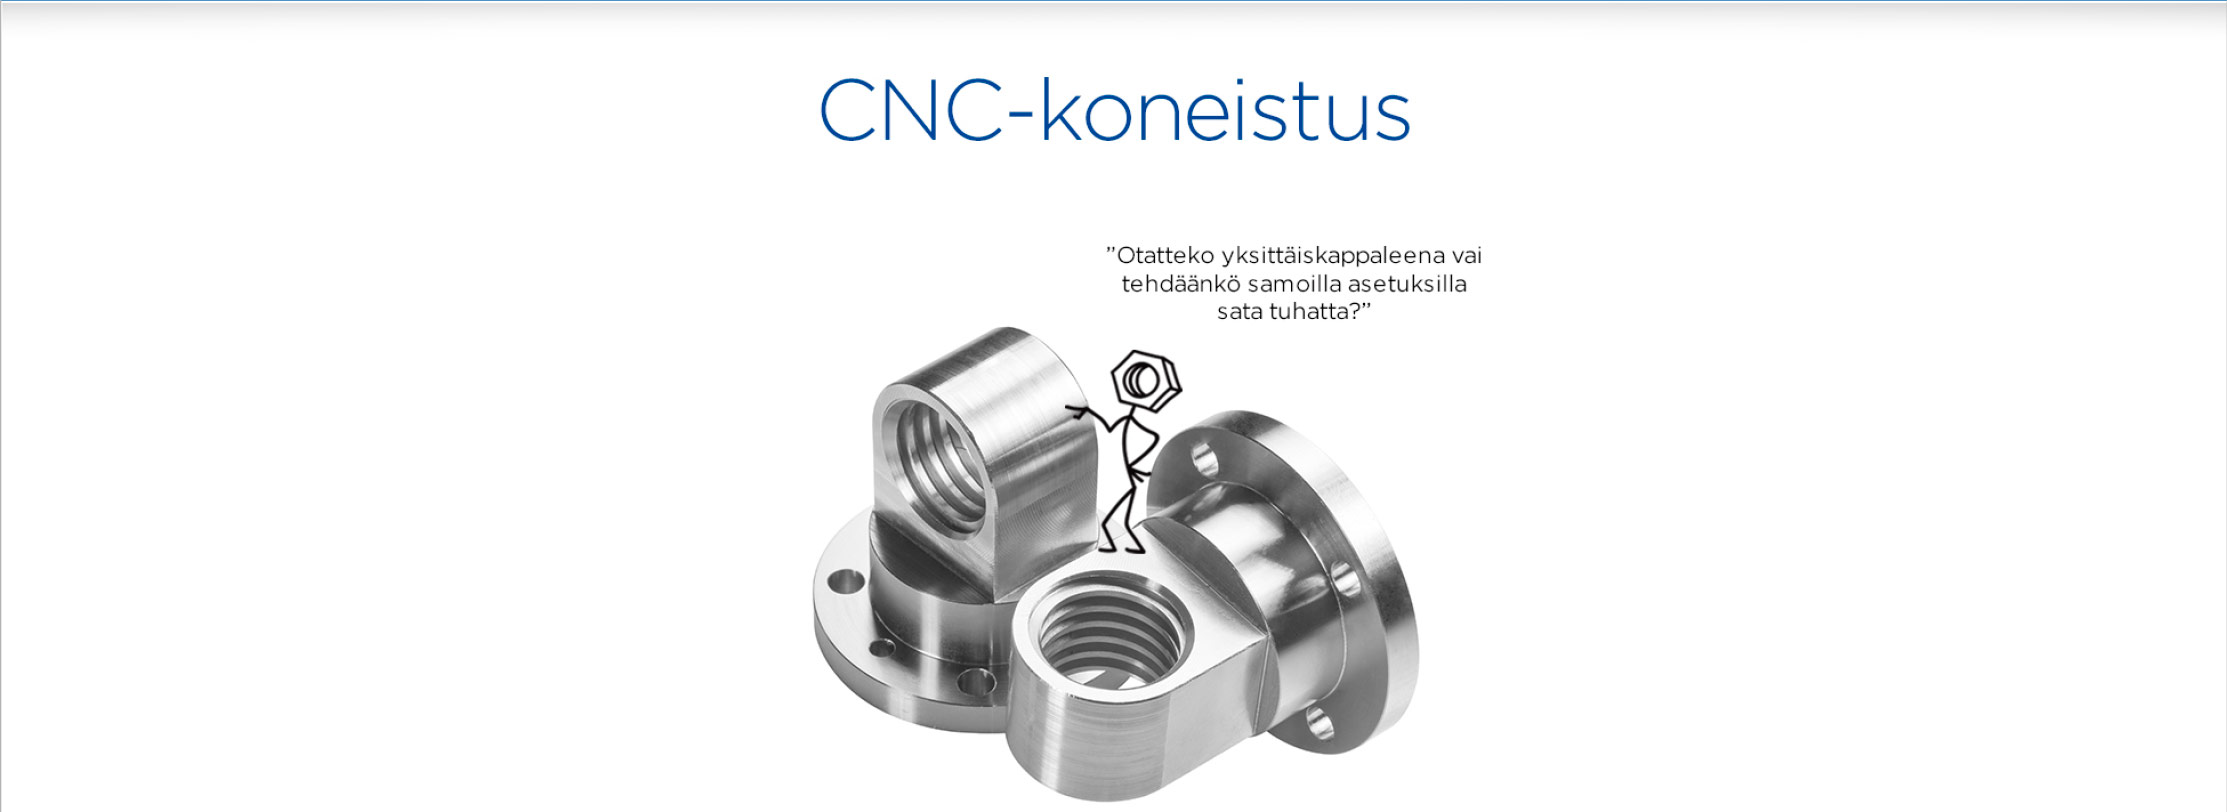 helapala-cnc-koneistus